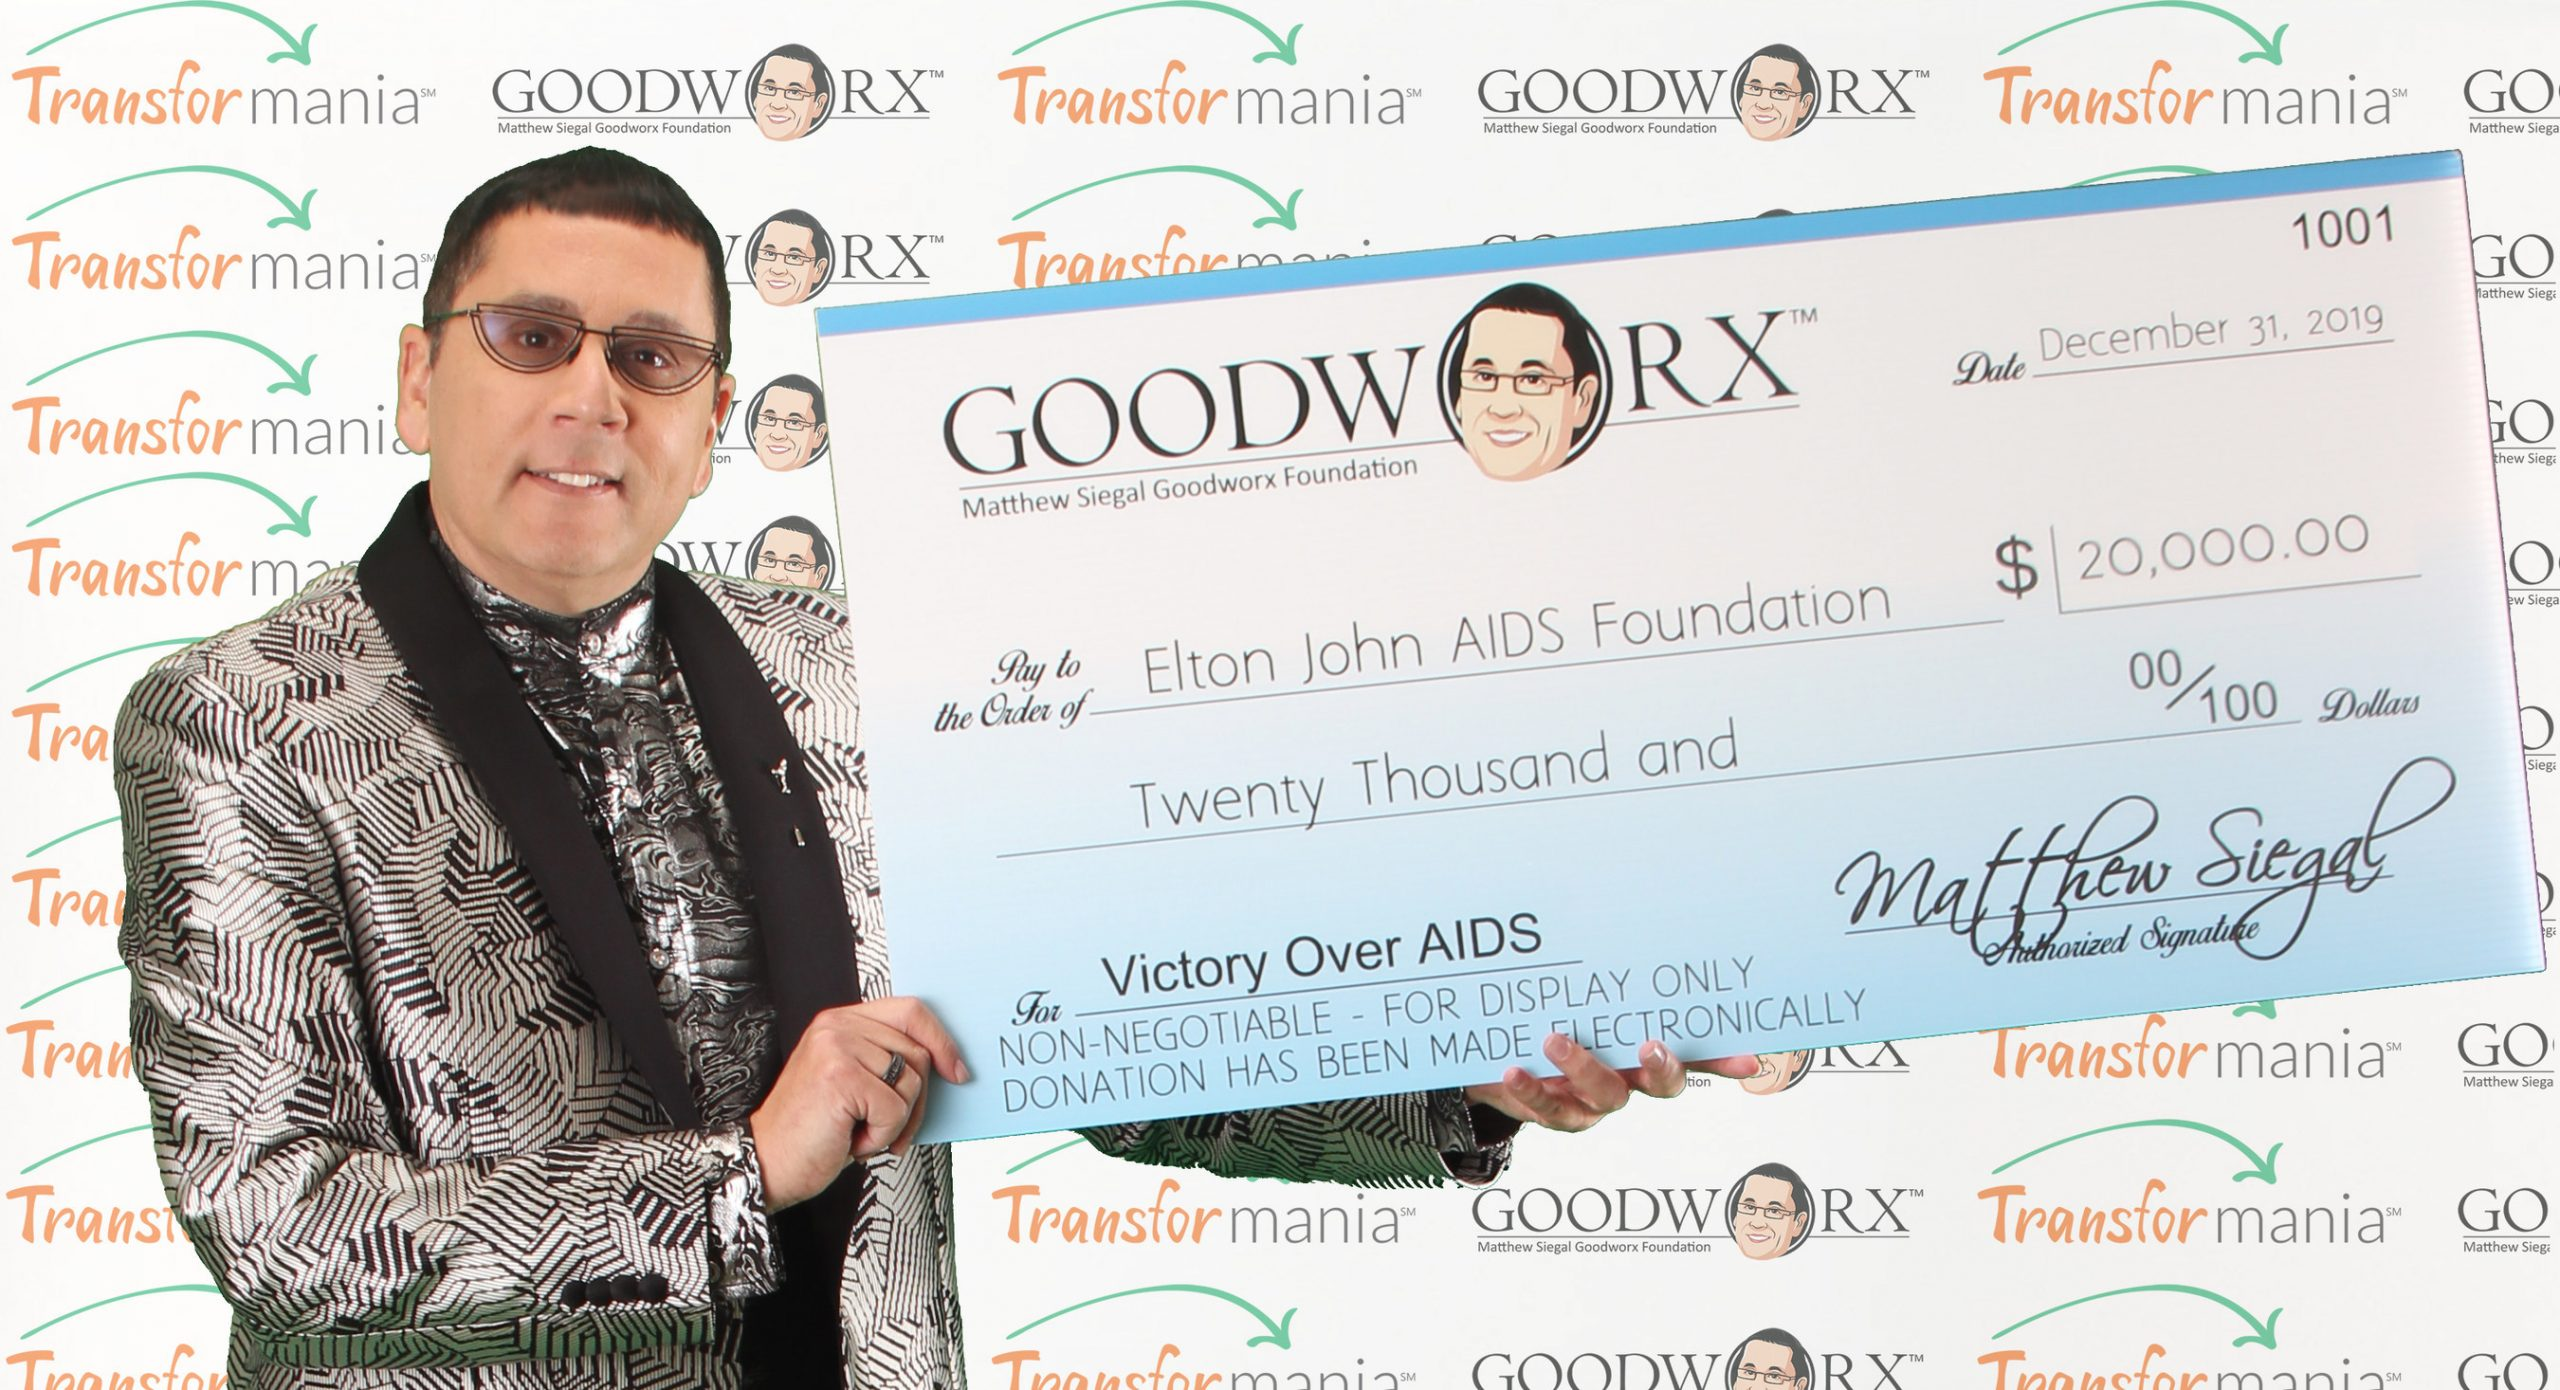 Tech Entrepreneur Matthew Siegal Announces Donation to Elton John AIDS Foundation